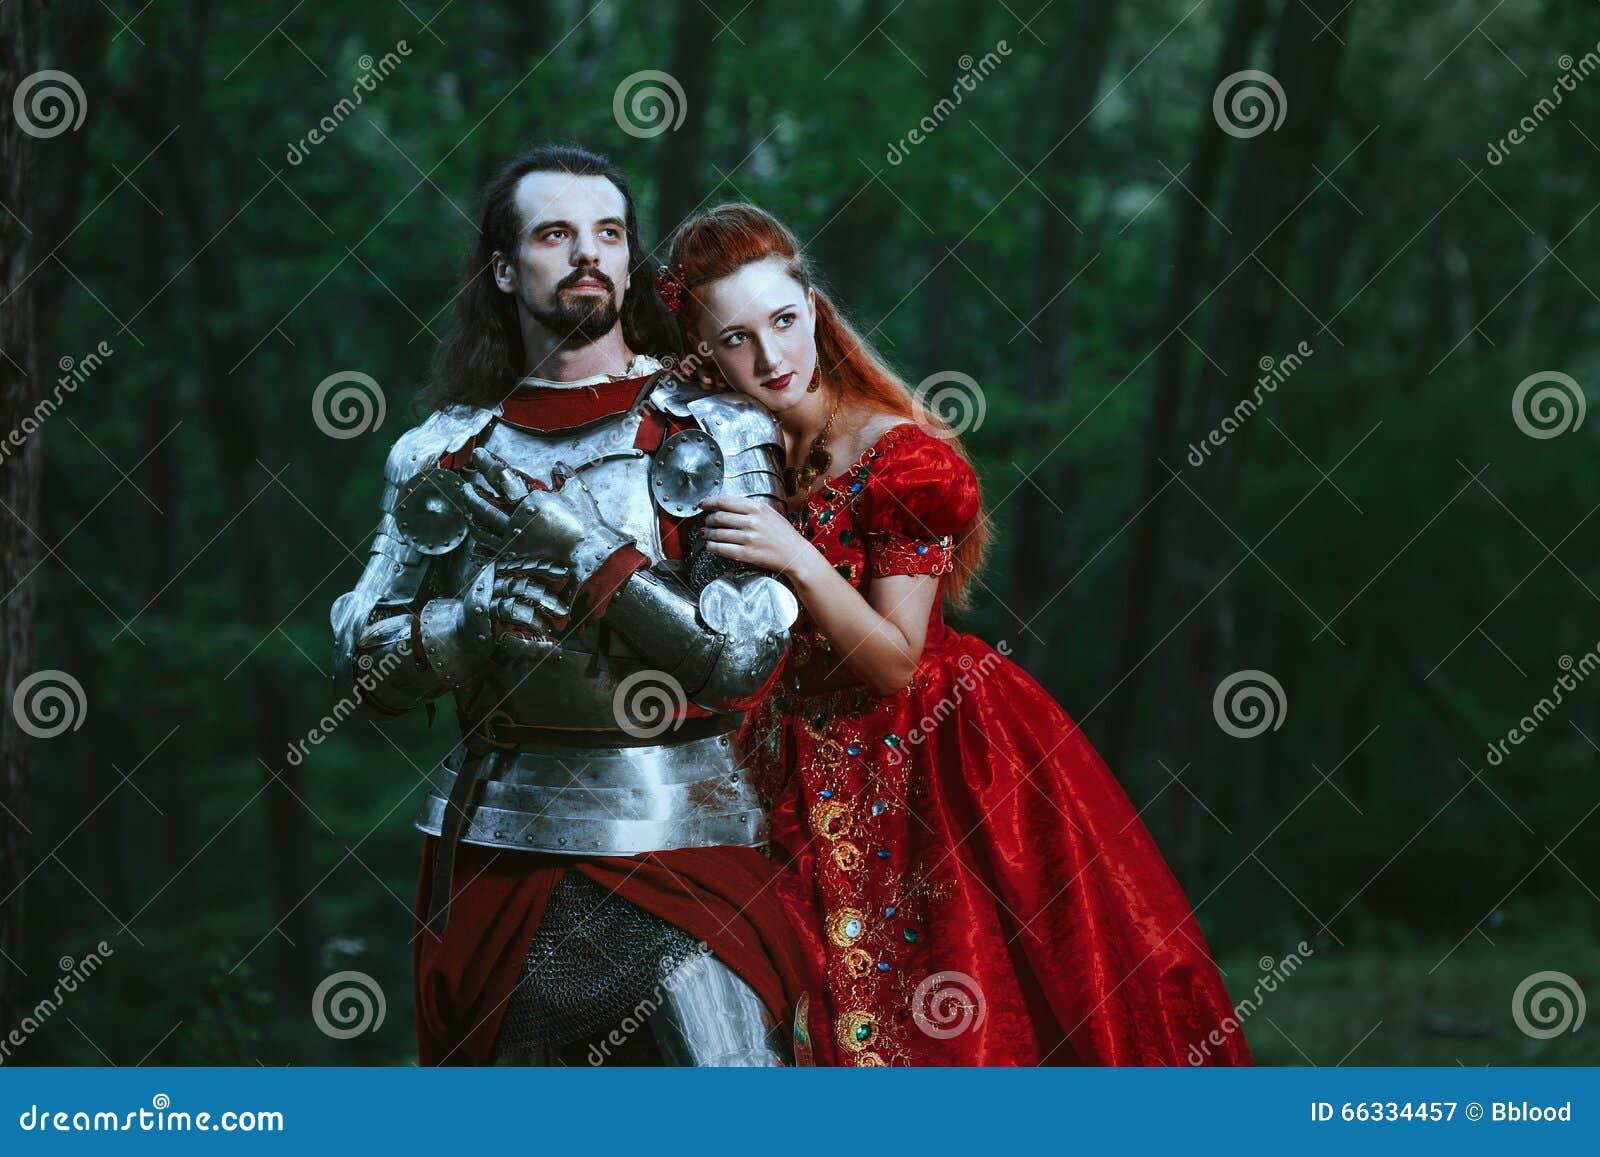 Middeleeuwse ridder met dame